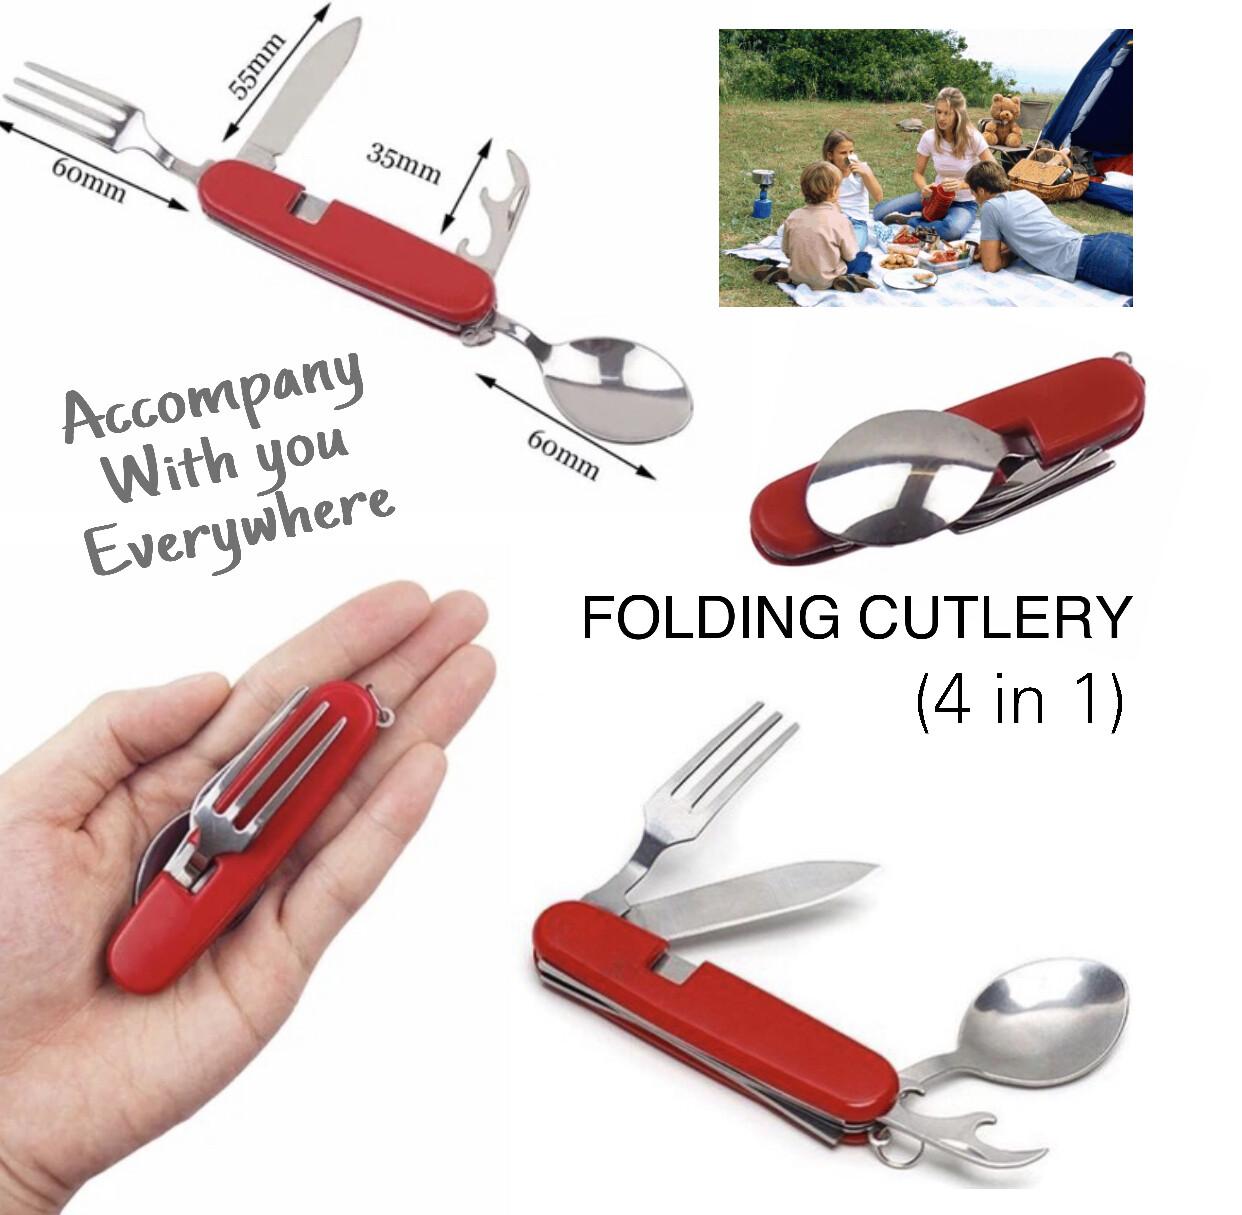 Folding Cutlery